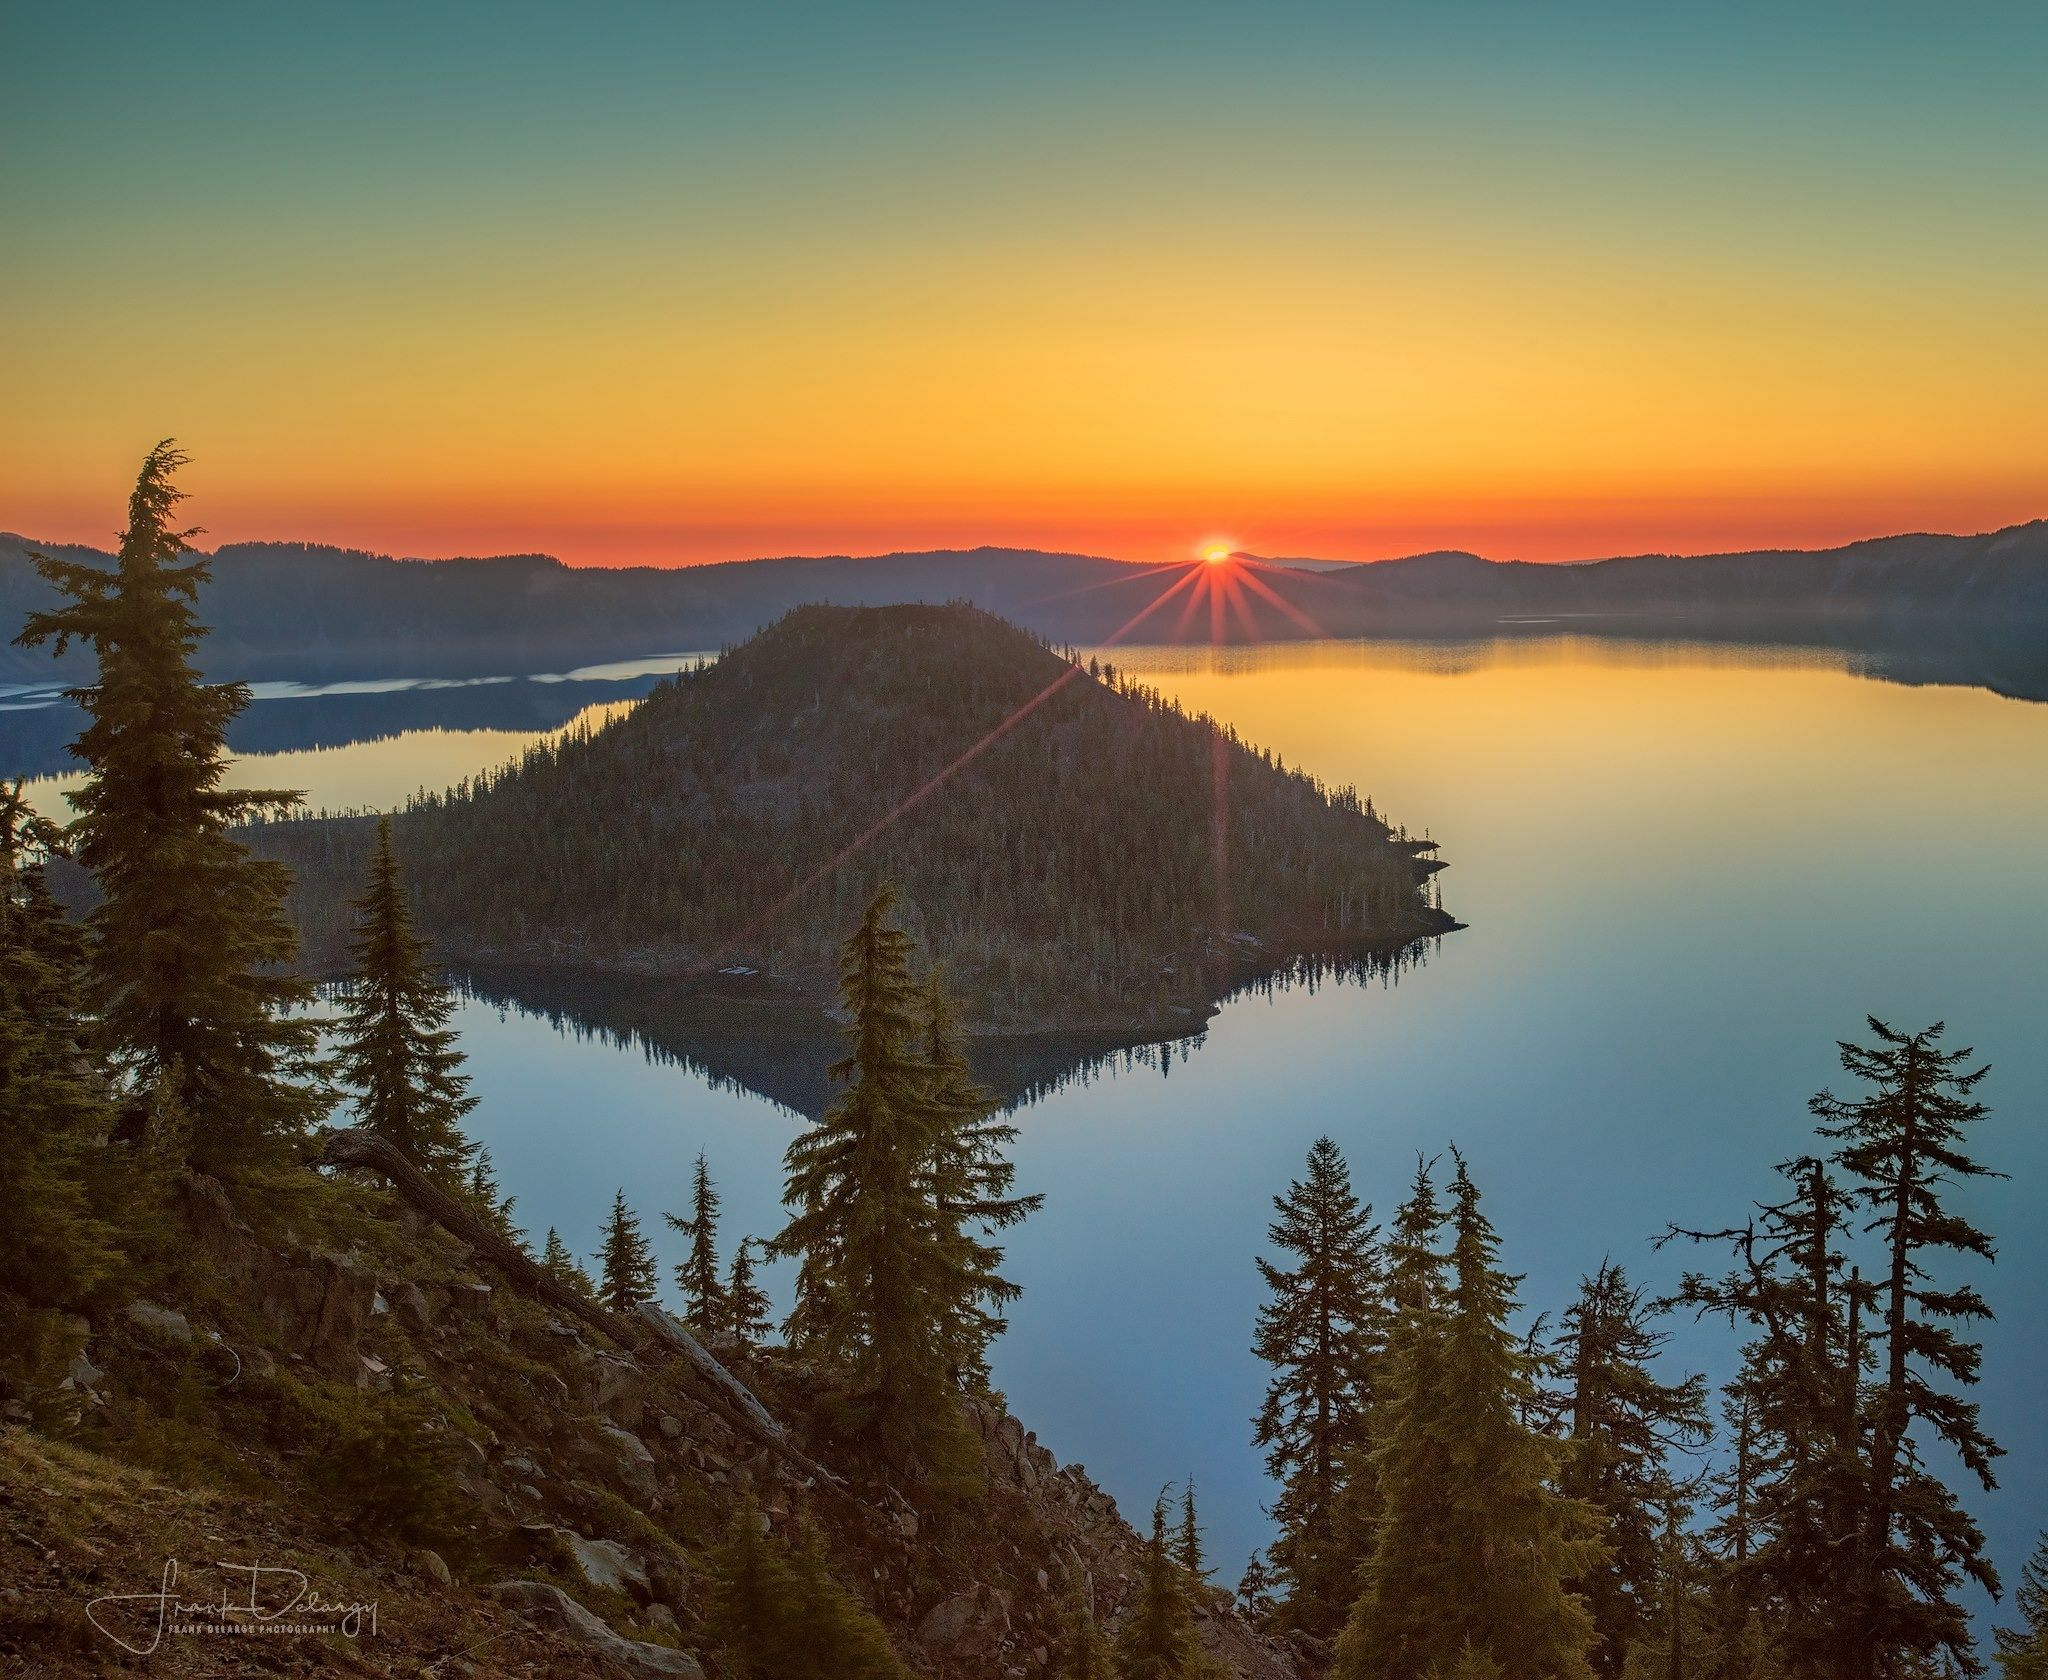 Oregon. Crater Lake NP, sunrise light on Wizard Island